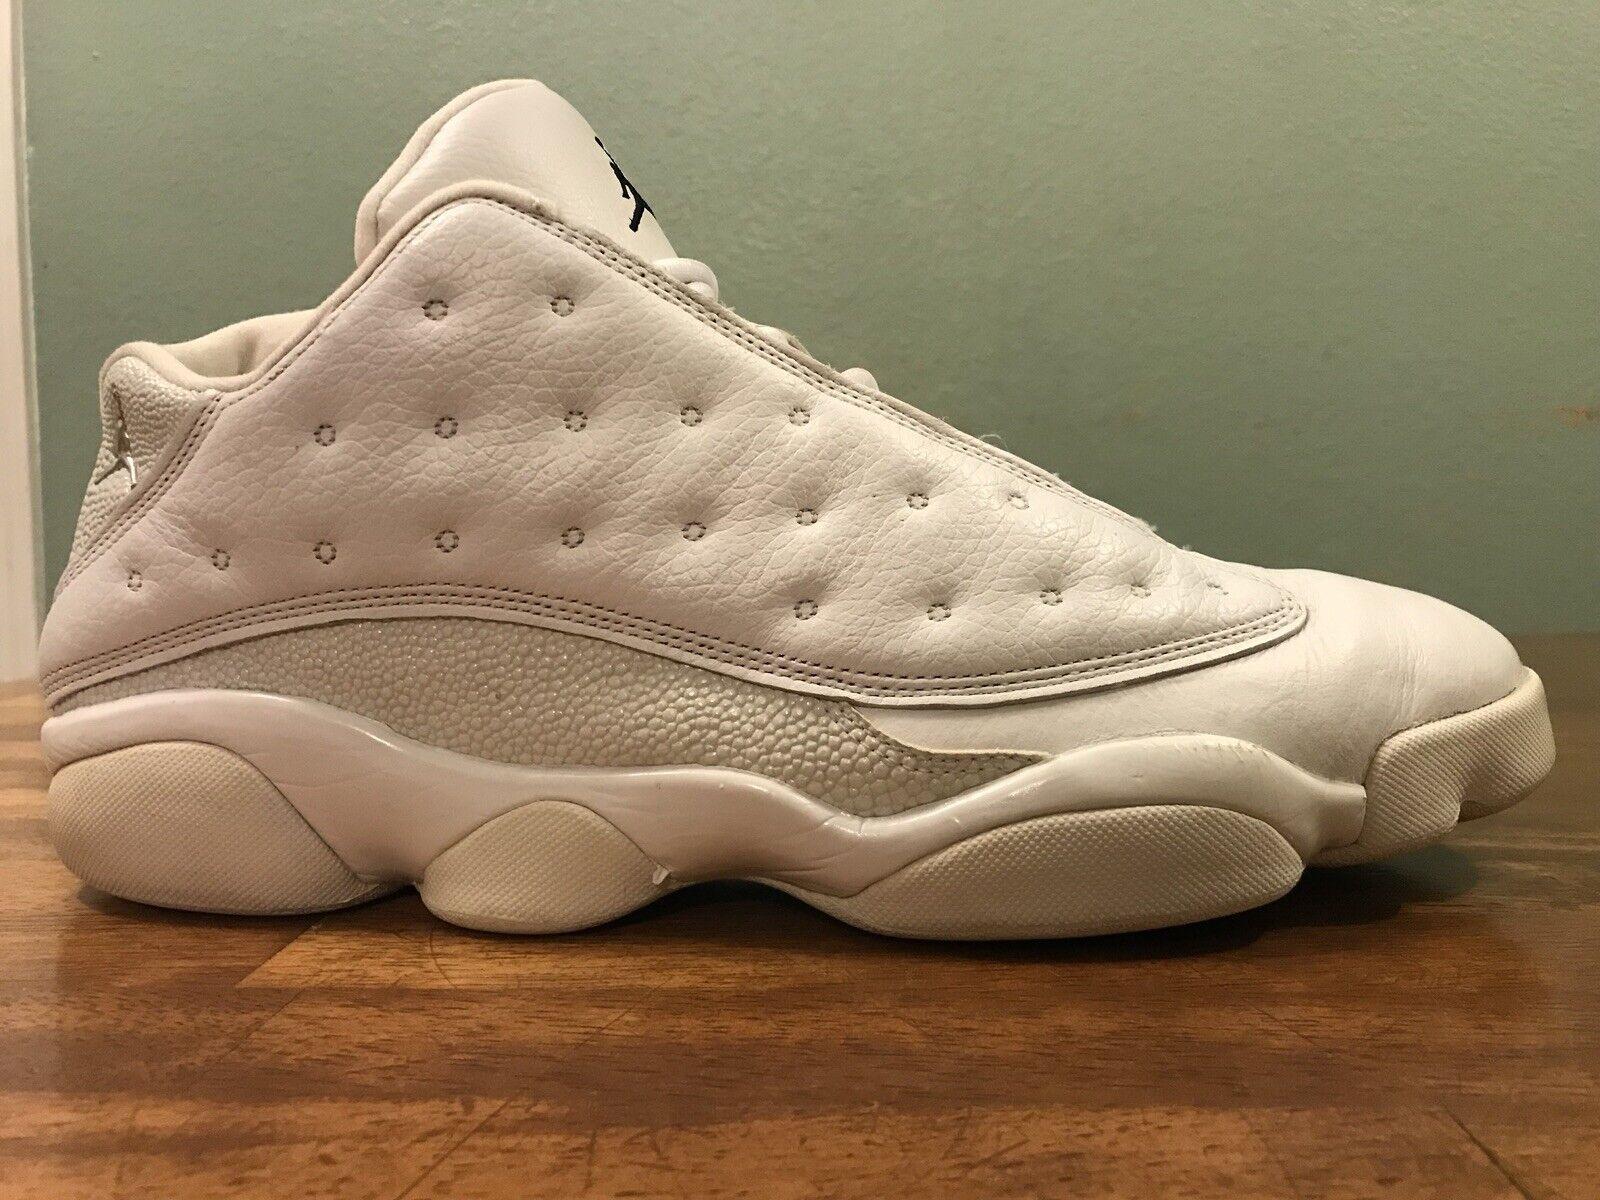 2005 Nike Air Jordan 13 Retro Low WHite Navy Ice blueee Men's Size 13